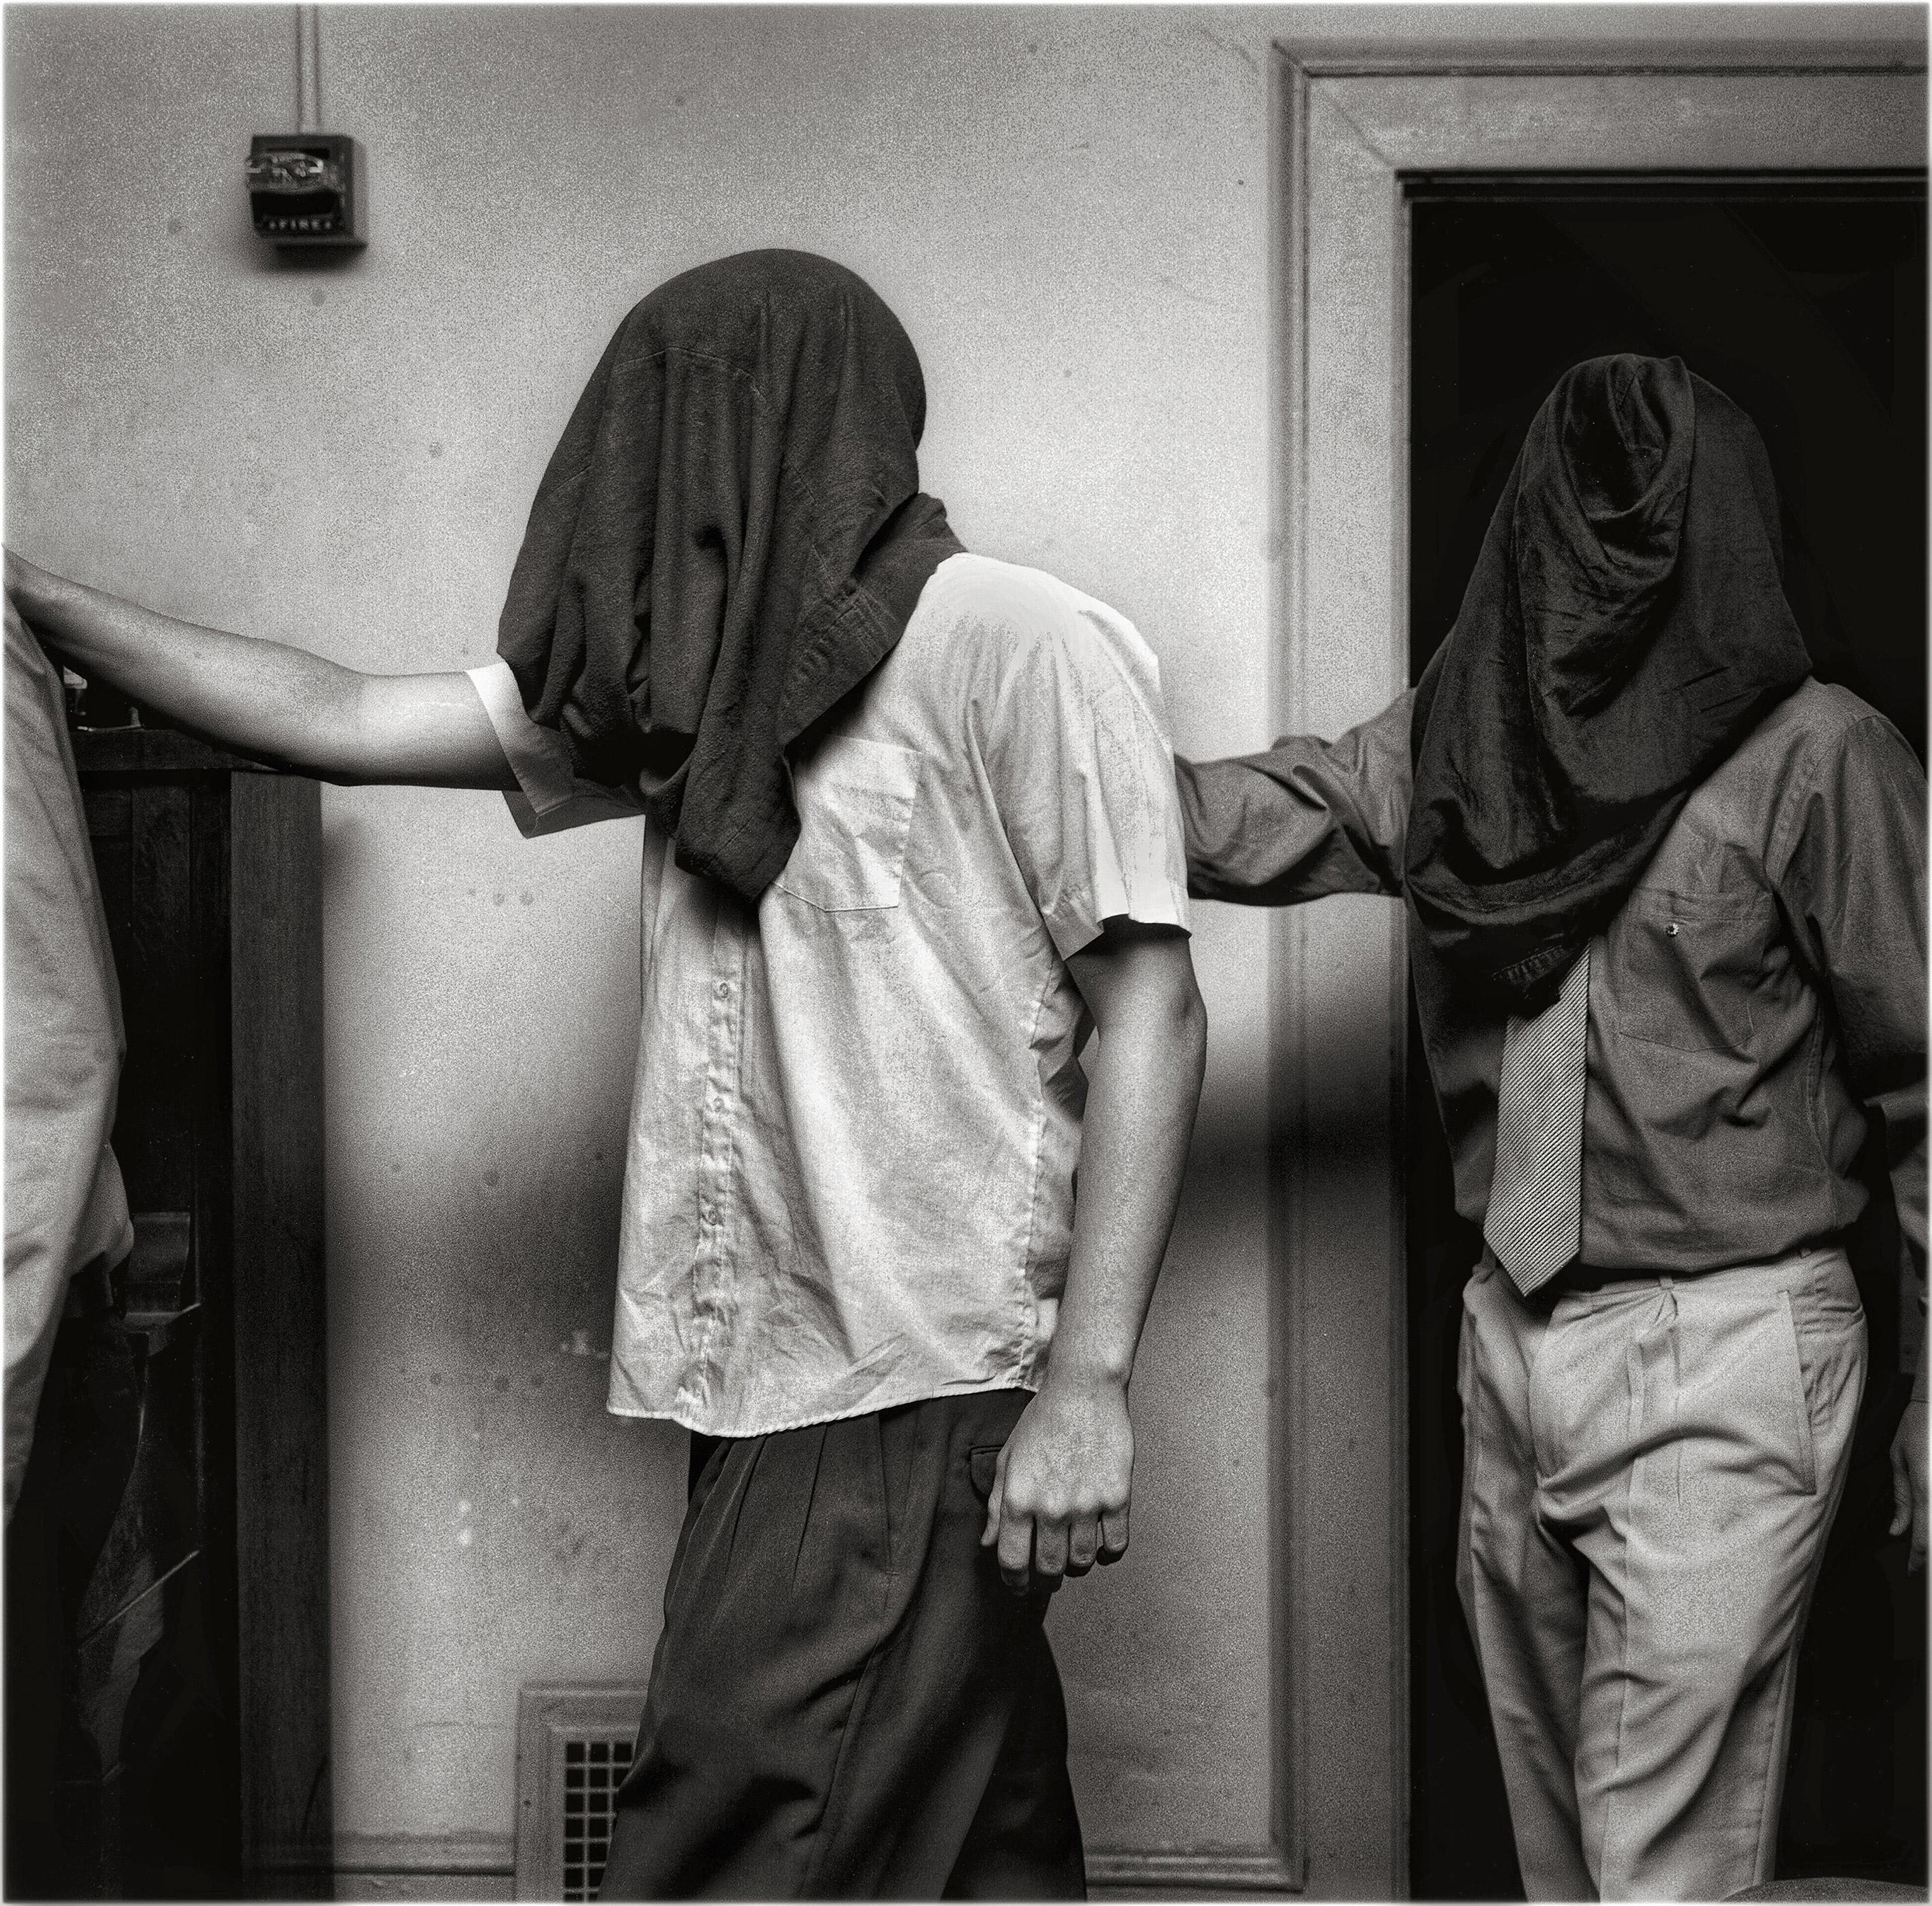 Shrouded In Secrecy, Photos Capture Life Inside A -5881